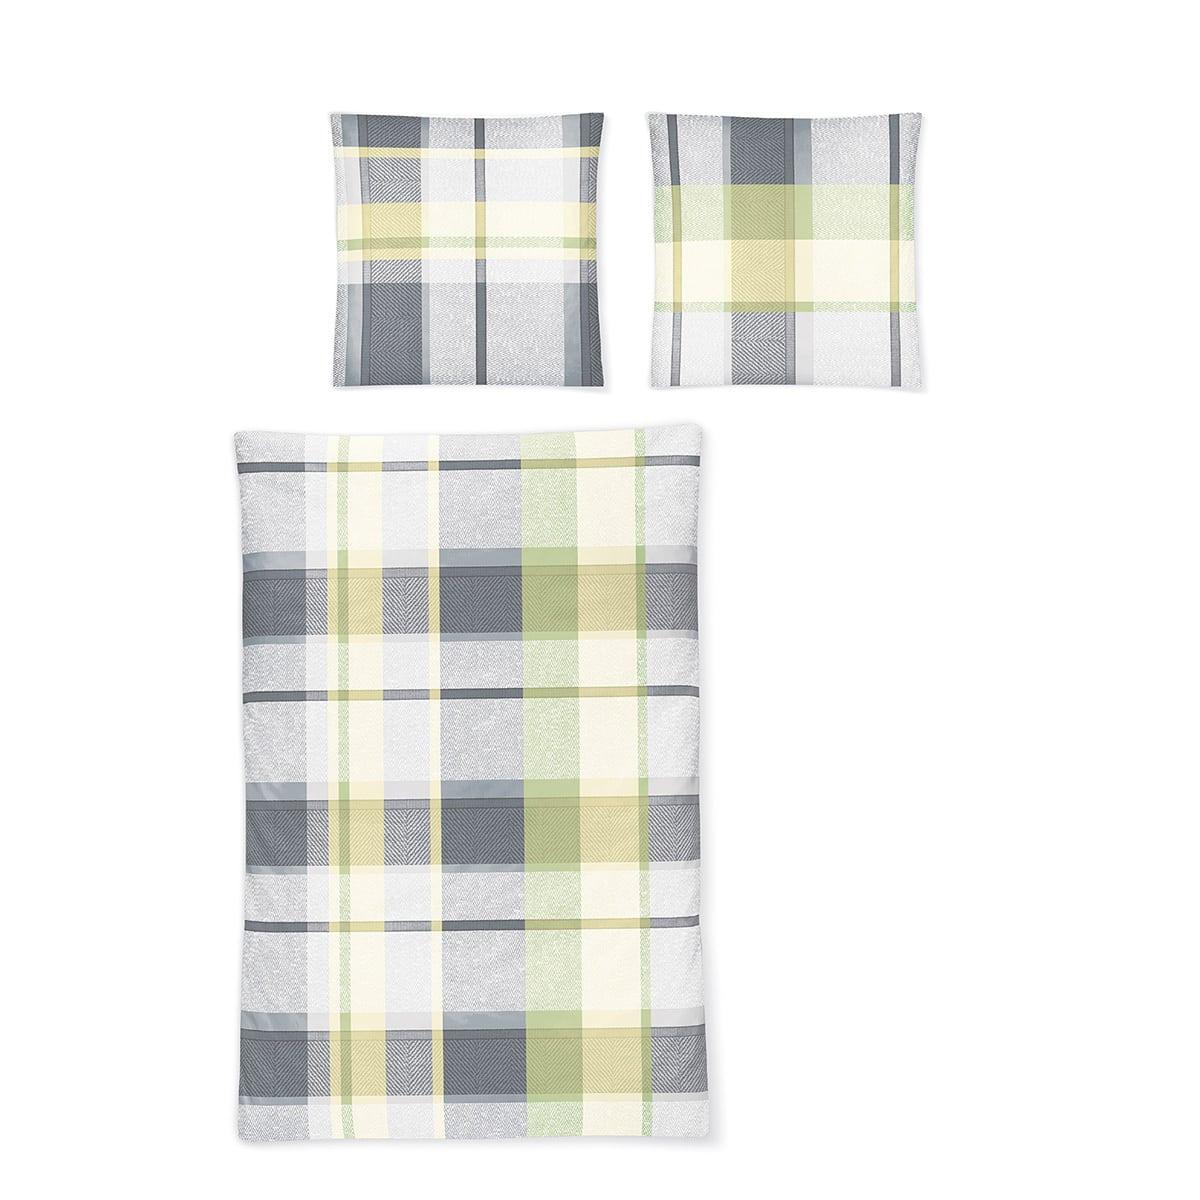 irisette biber bettw sche dublin 8654 31 g nstig online kaufen bei bettwaren shop. Black Bedroom Furniture Sets. Home Design Ideas